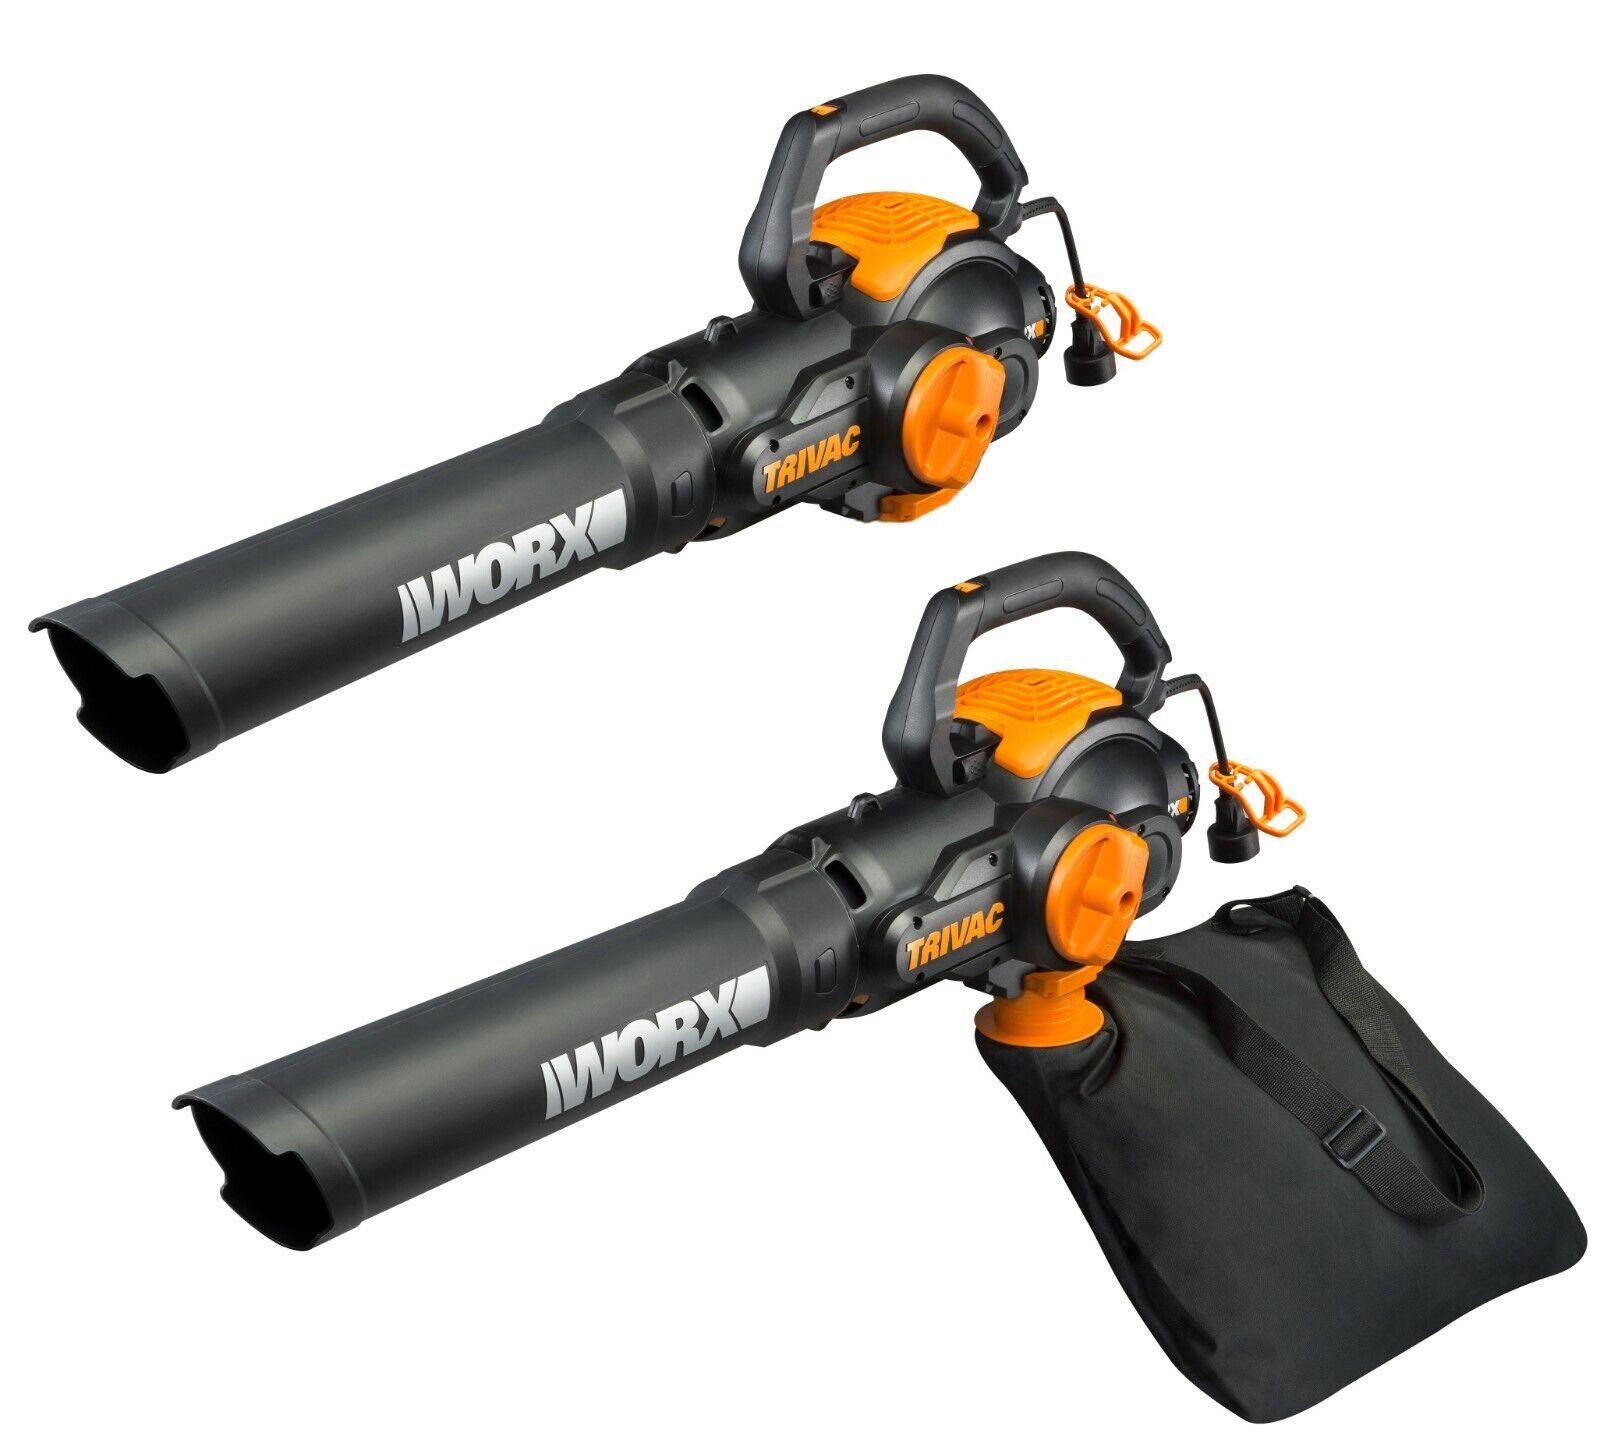 worx-wg512-trivac-12-amp-electric-3-in-1-leaf-blower-mulcher-yard-vacuum